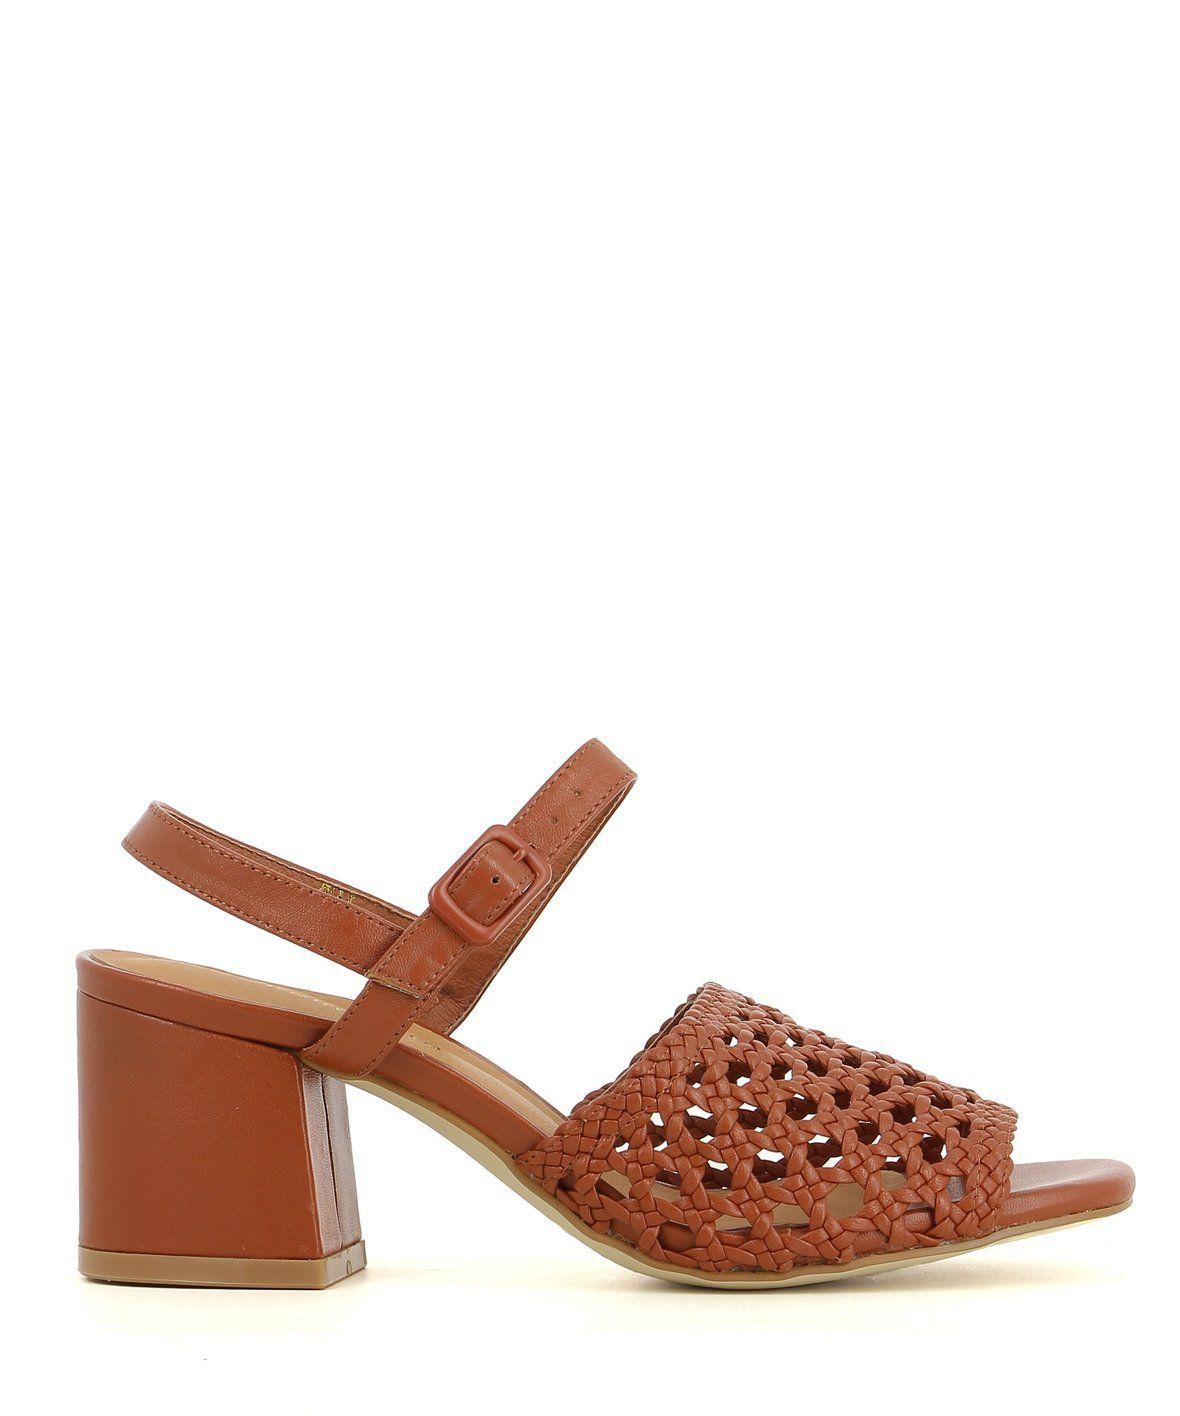 Buy 2 Baia Vista Tal Brandy Zomp Shoez Zomp Heeled Mules Stuff To Buy Heels